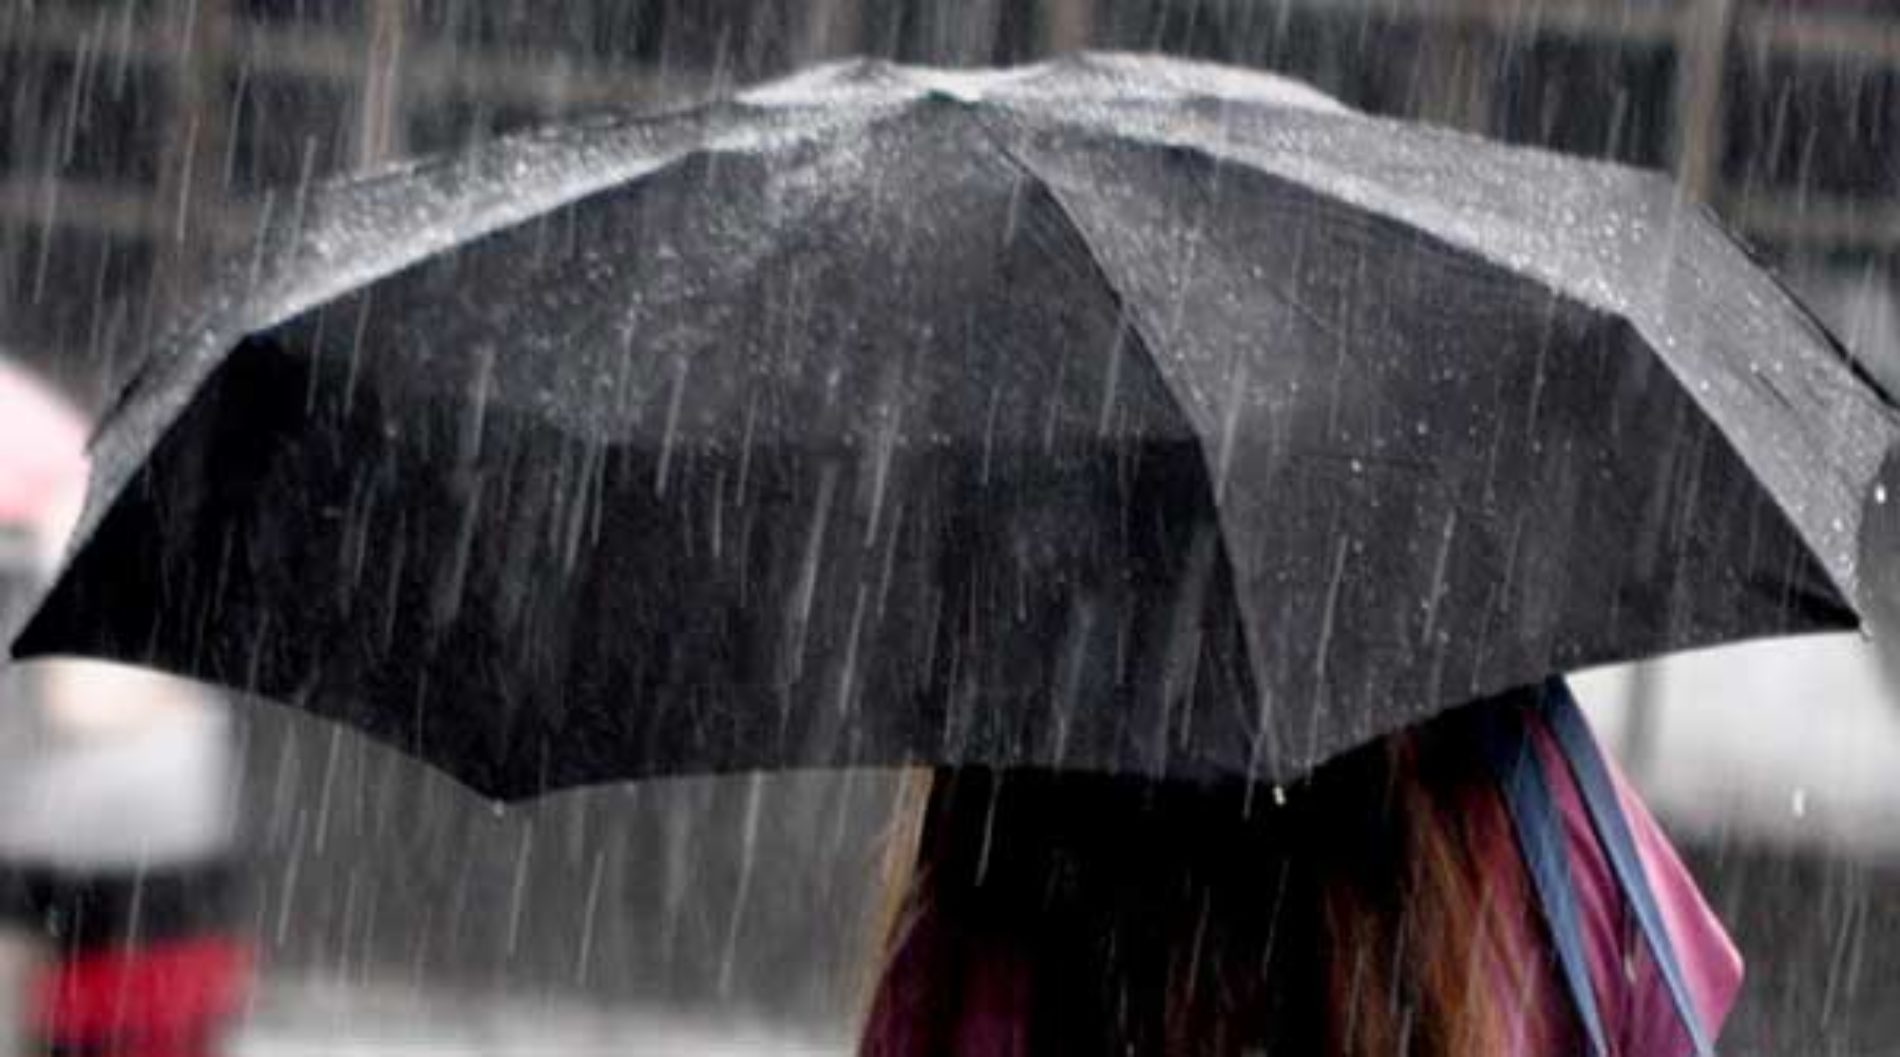 Fim de semana com descida de temperatura, chuva e trovoada